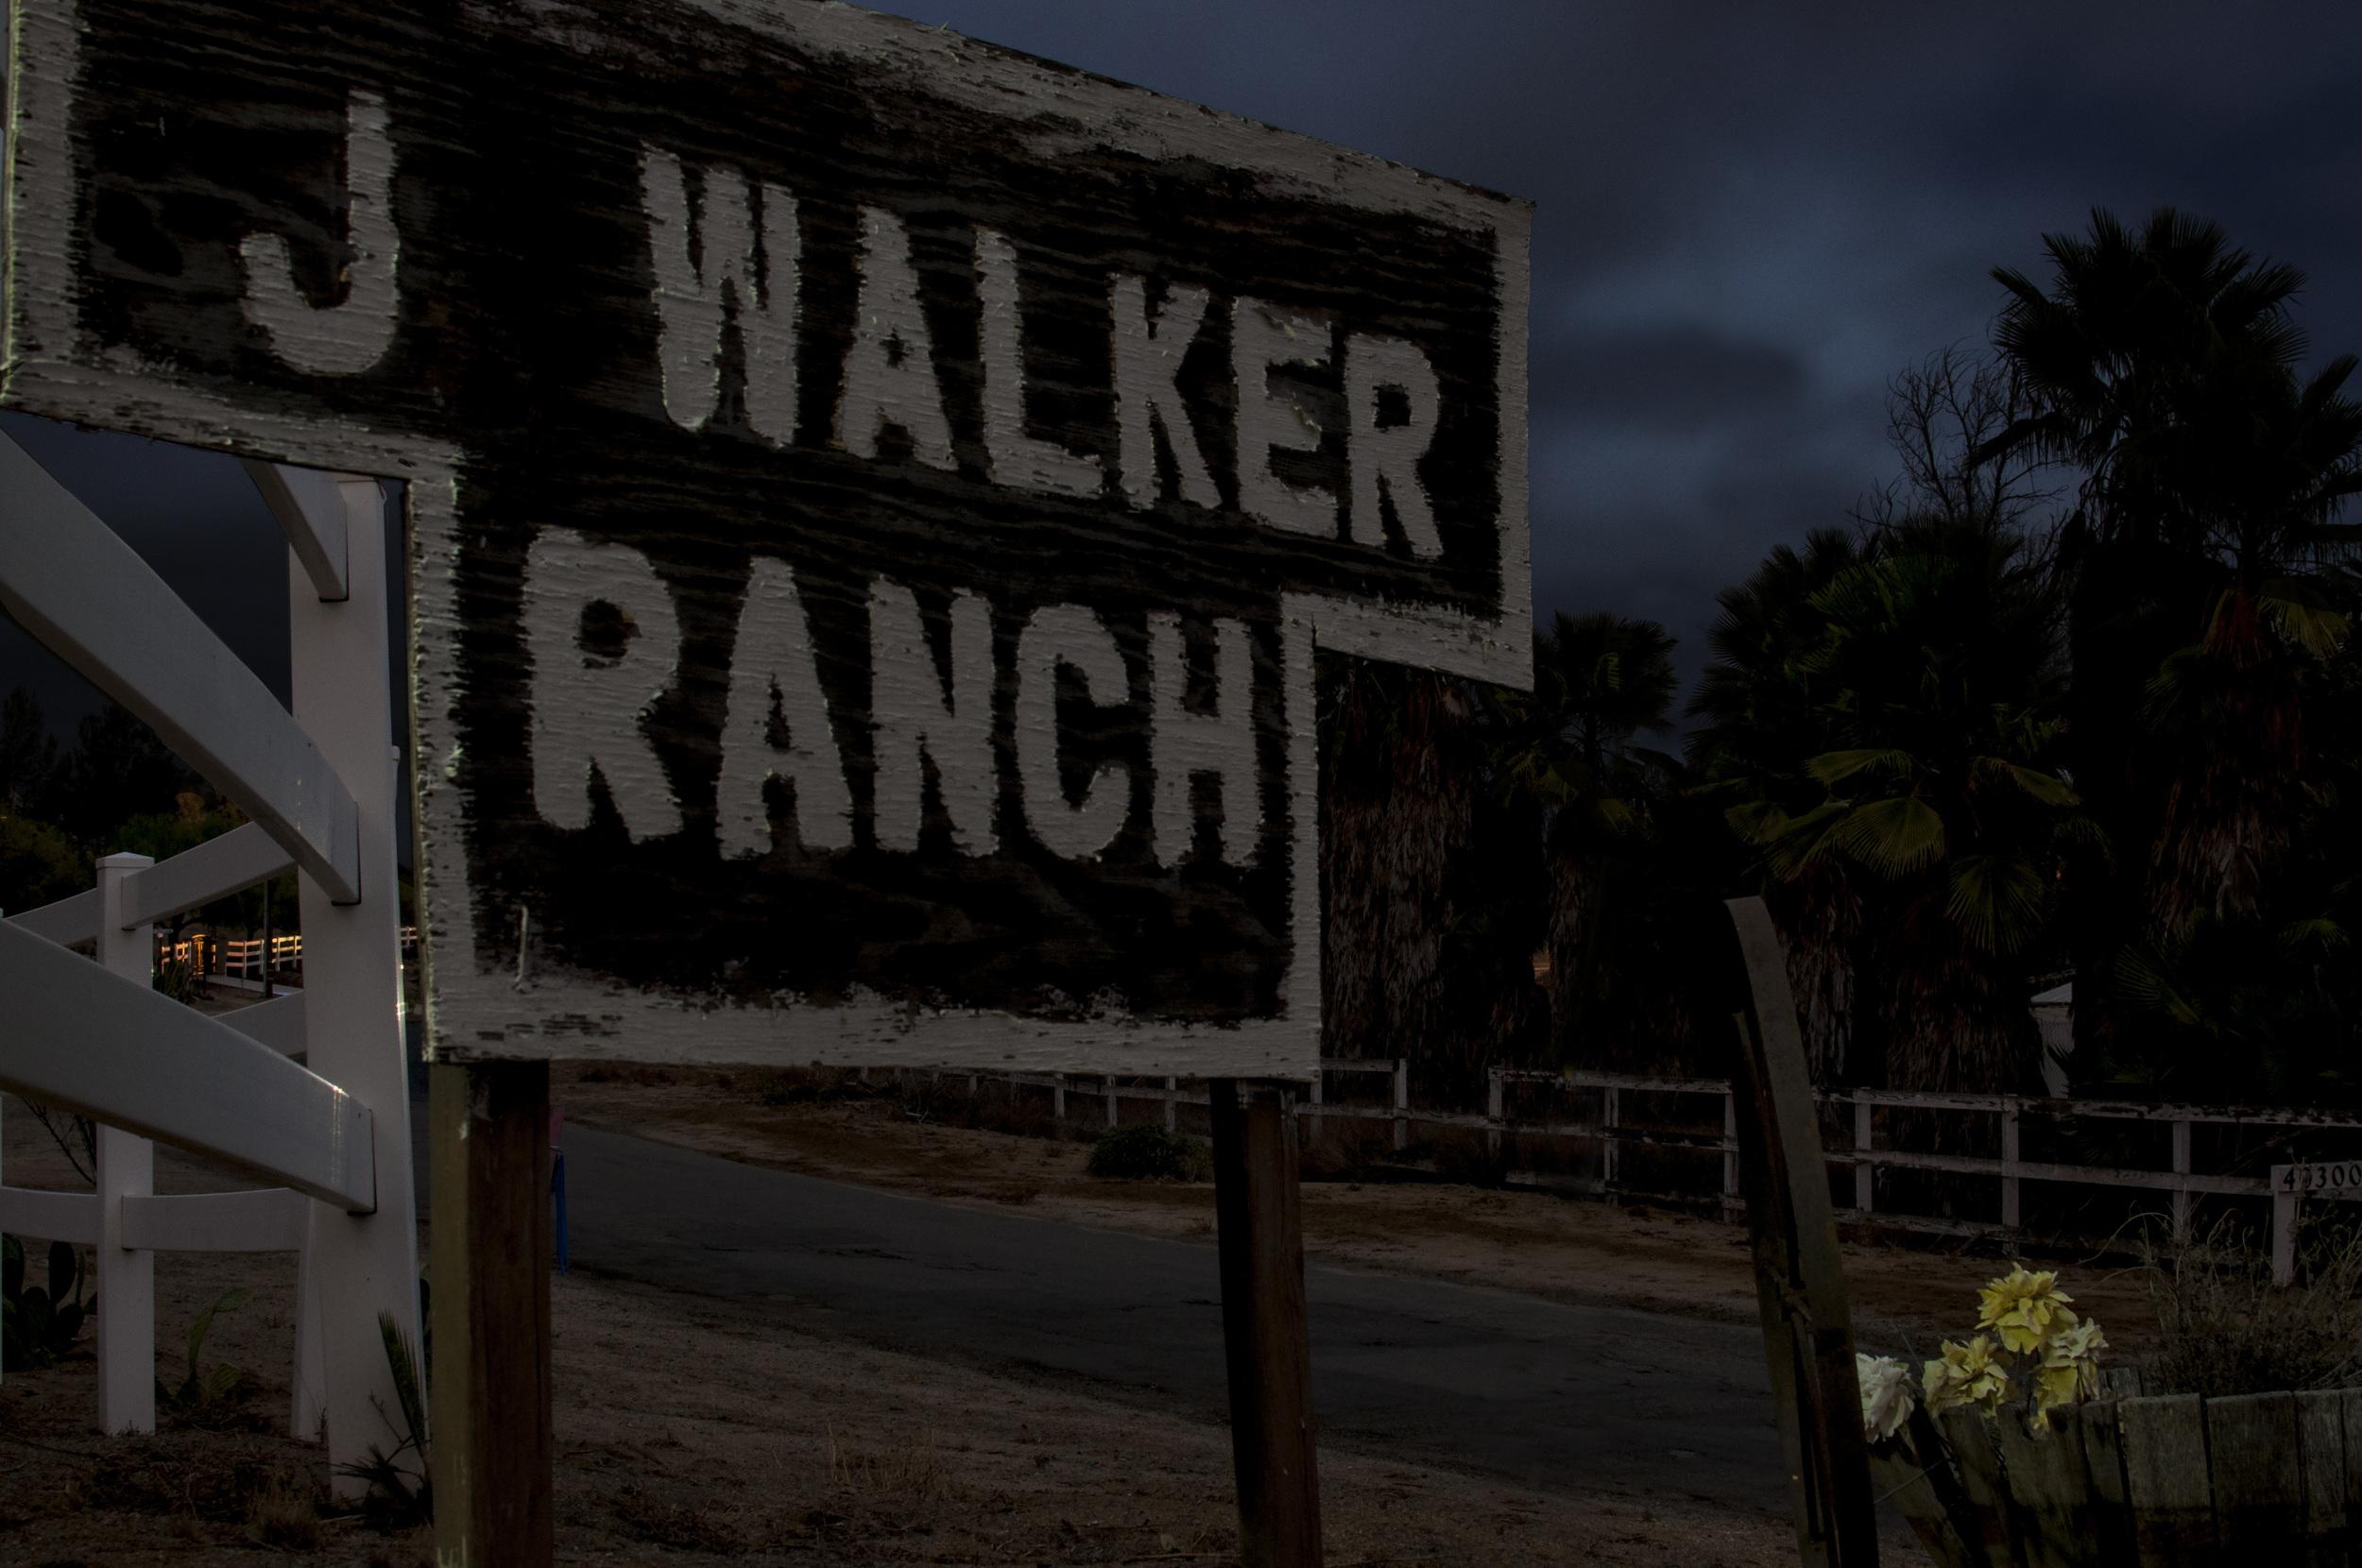 J Walker Ranch.jpg